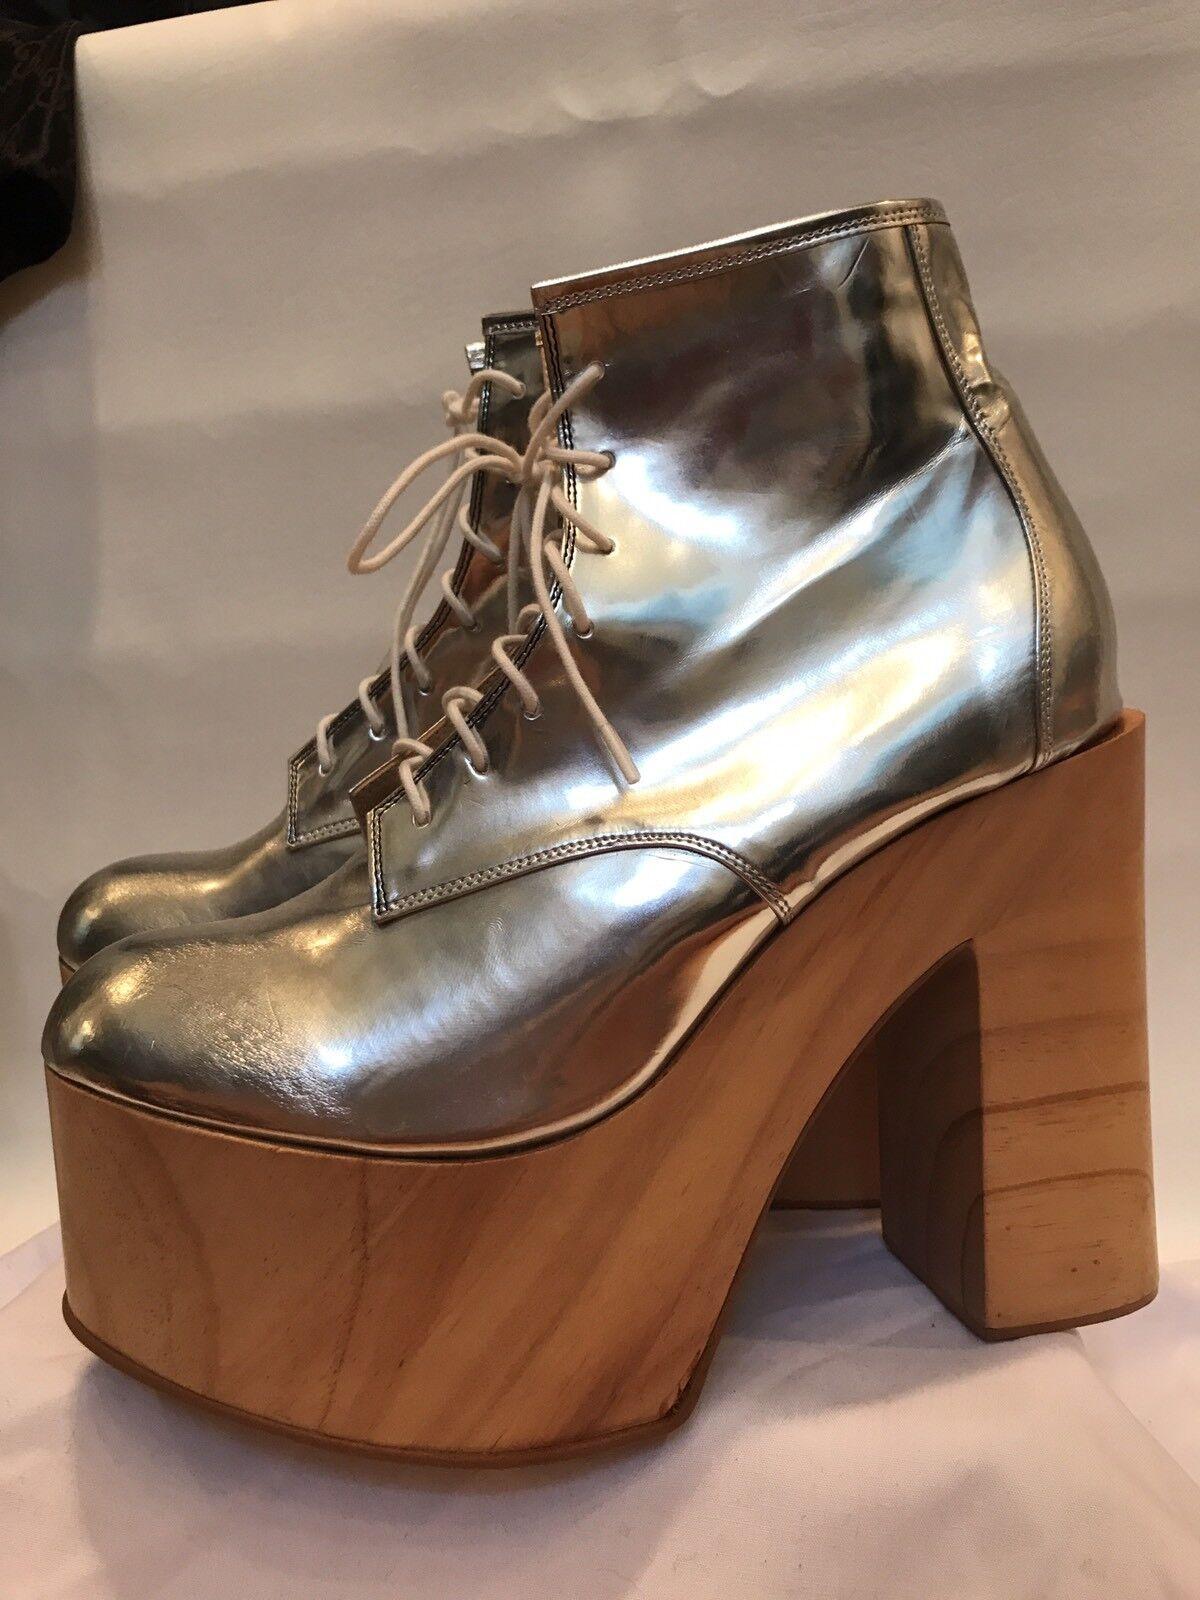 DEANDRI Wood PLATFORM BOOTS 9 Silver Metallic MIRROR Made In LA Jeffrey Campbell